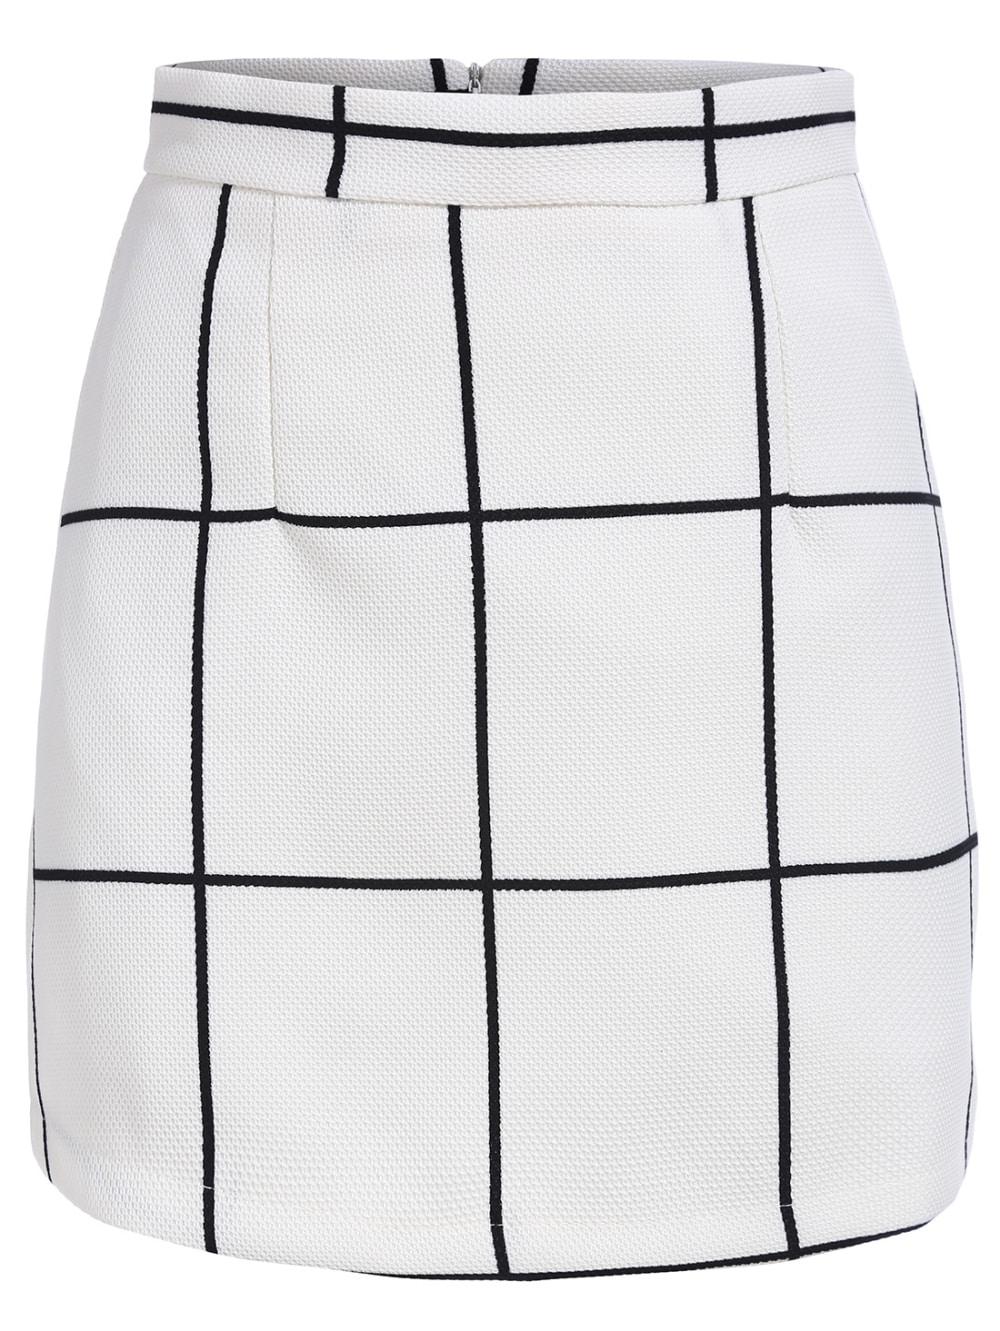 White Plaid Skirt